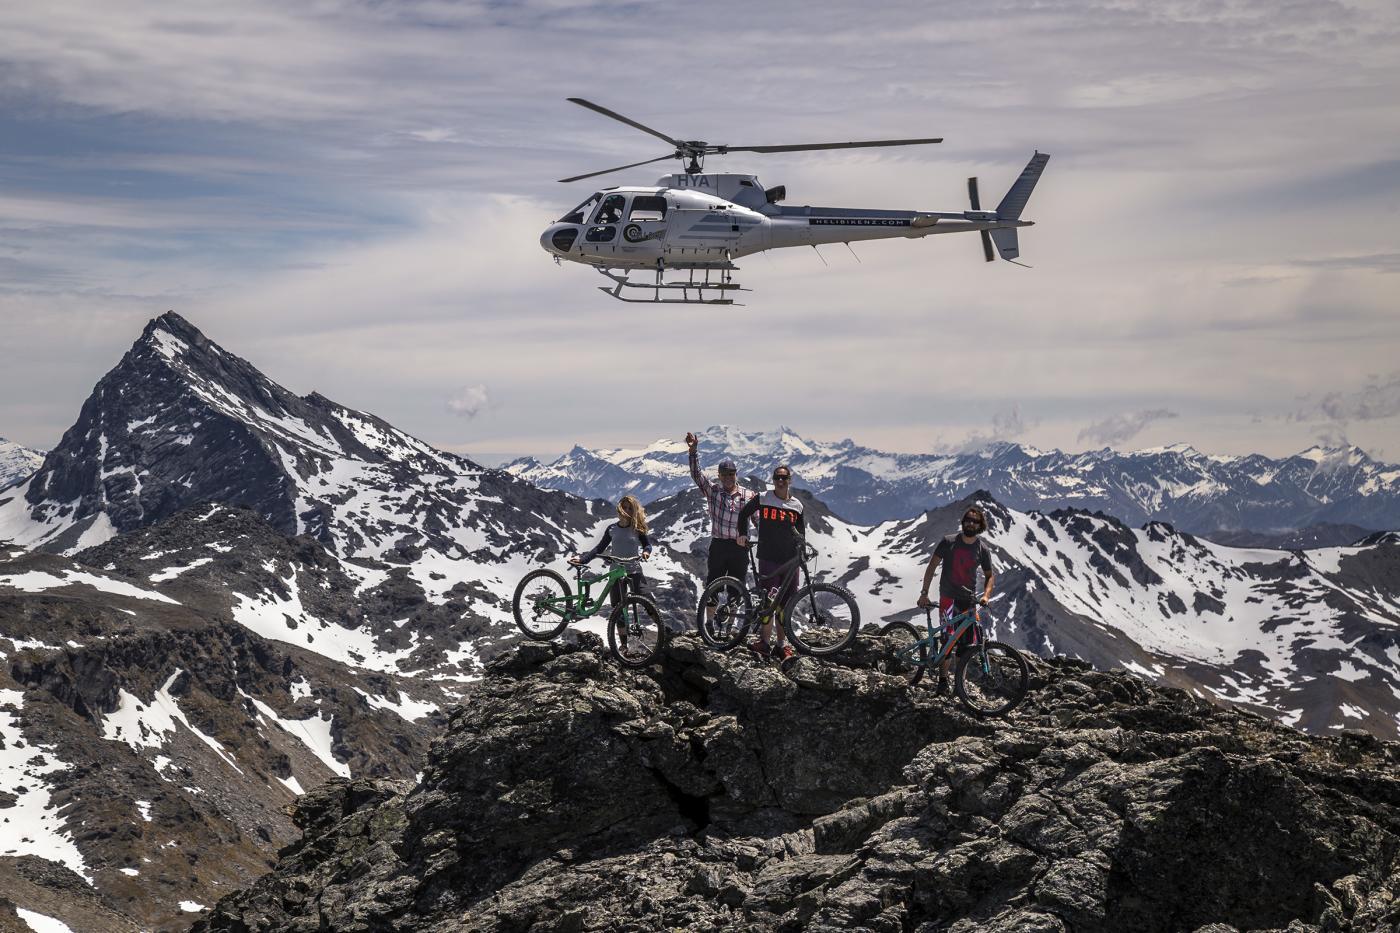 Heli-biking The Remarkables with HeliBikeNZ